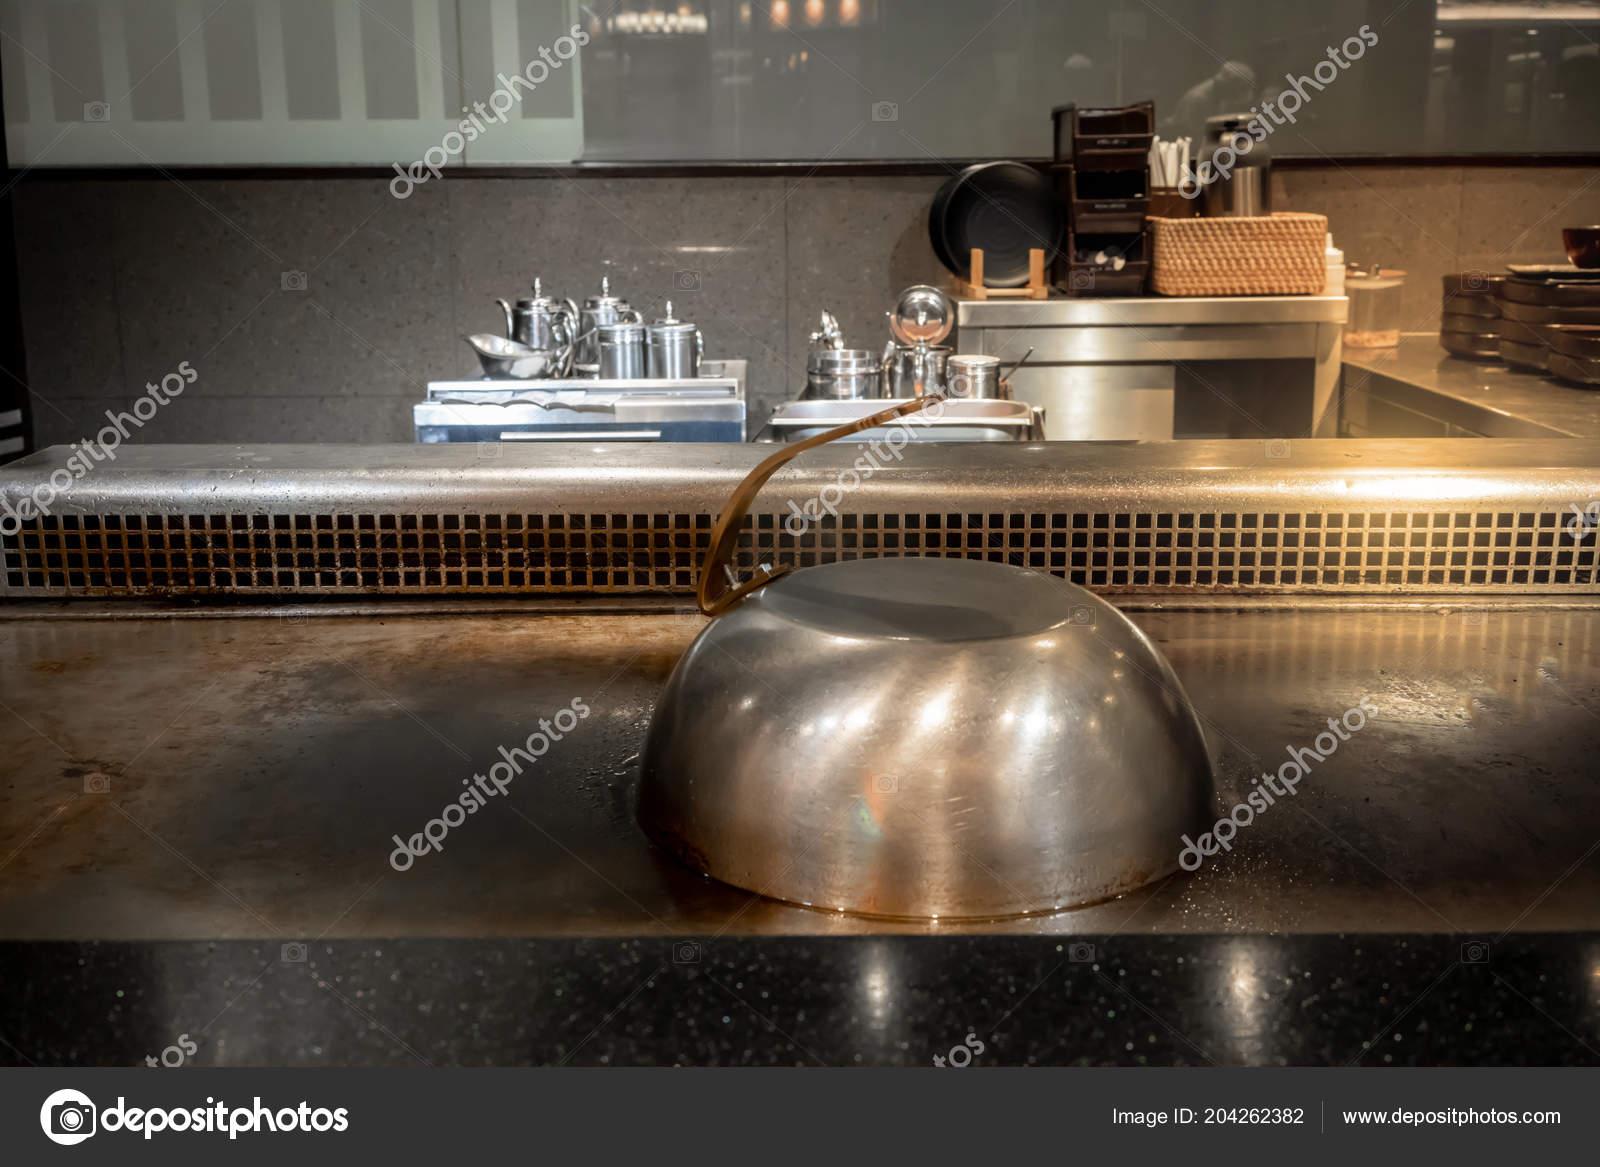 Chiuso Acciaio Inox Stile Giapponese Cucina Coperchio Cupola ...